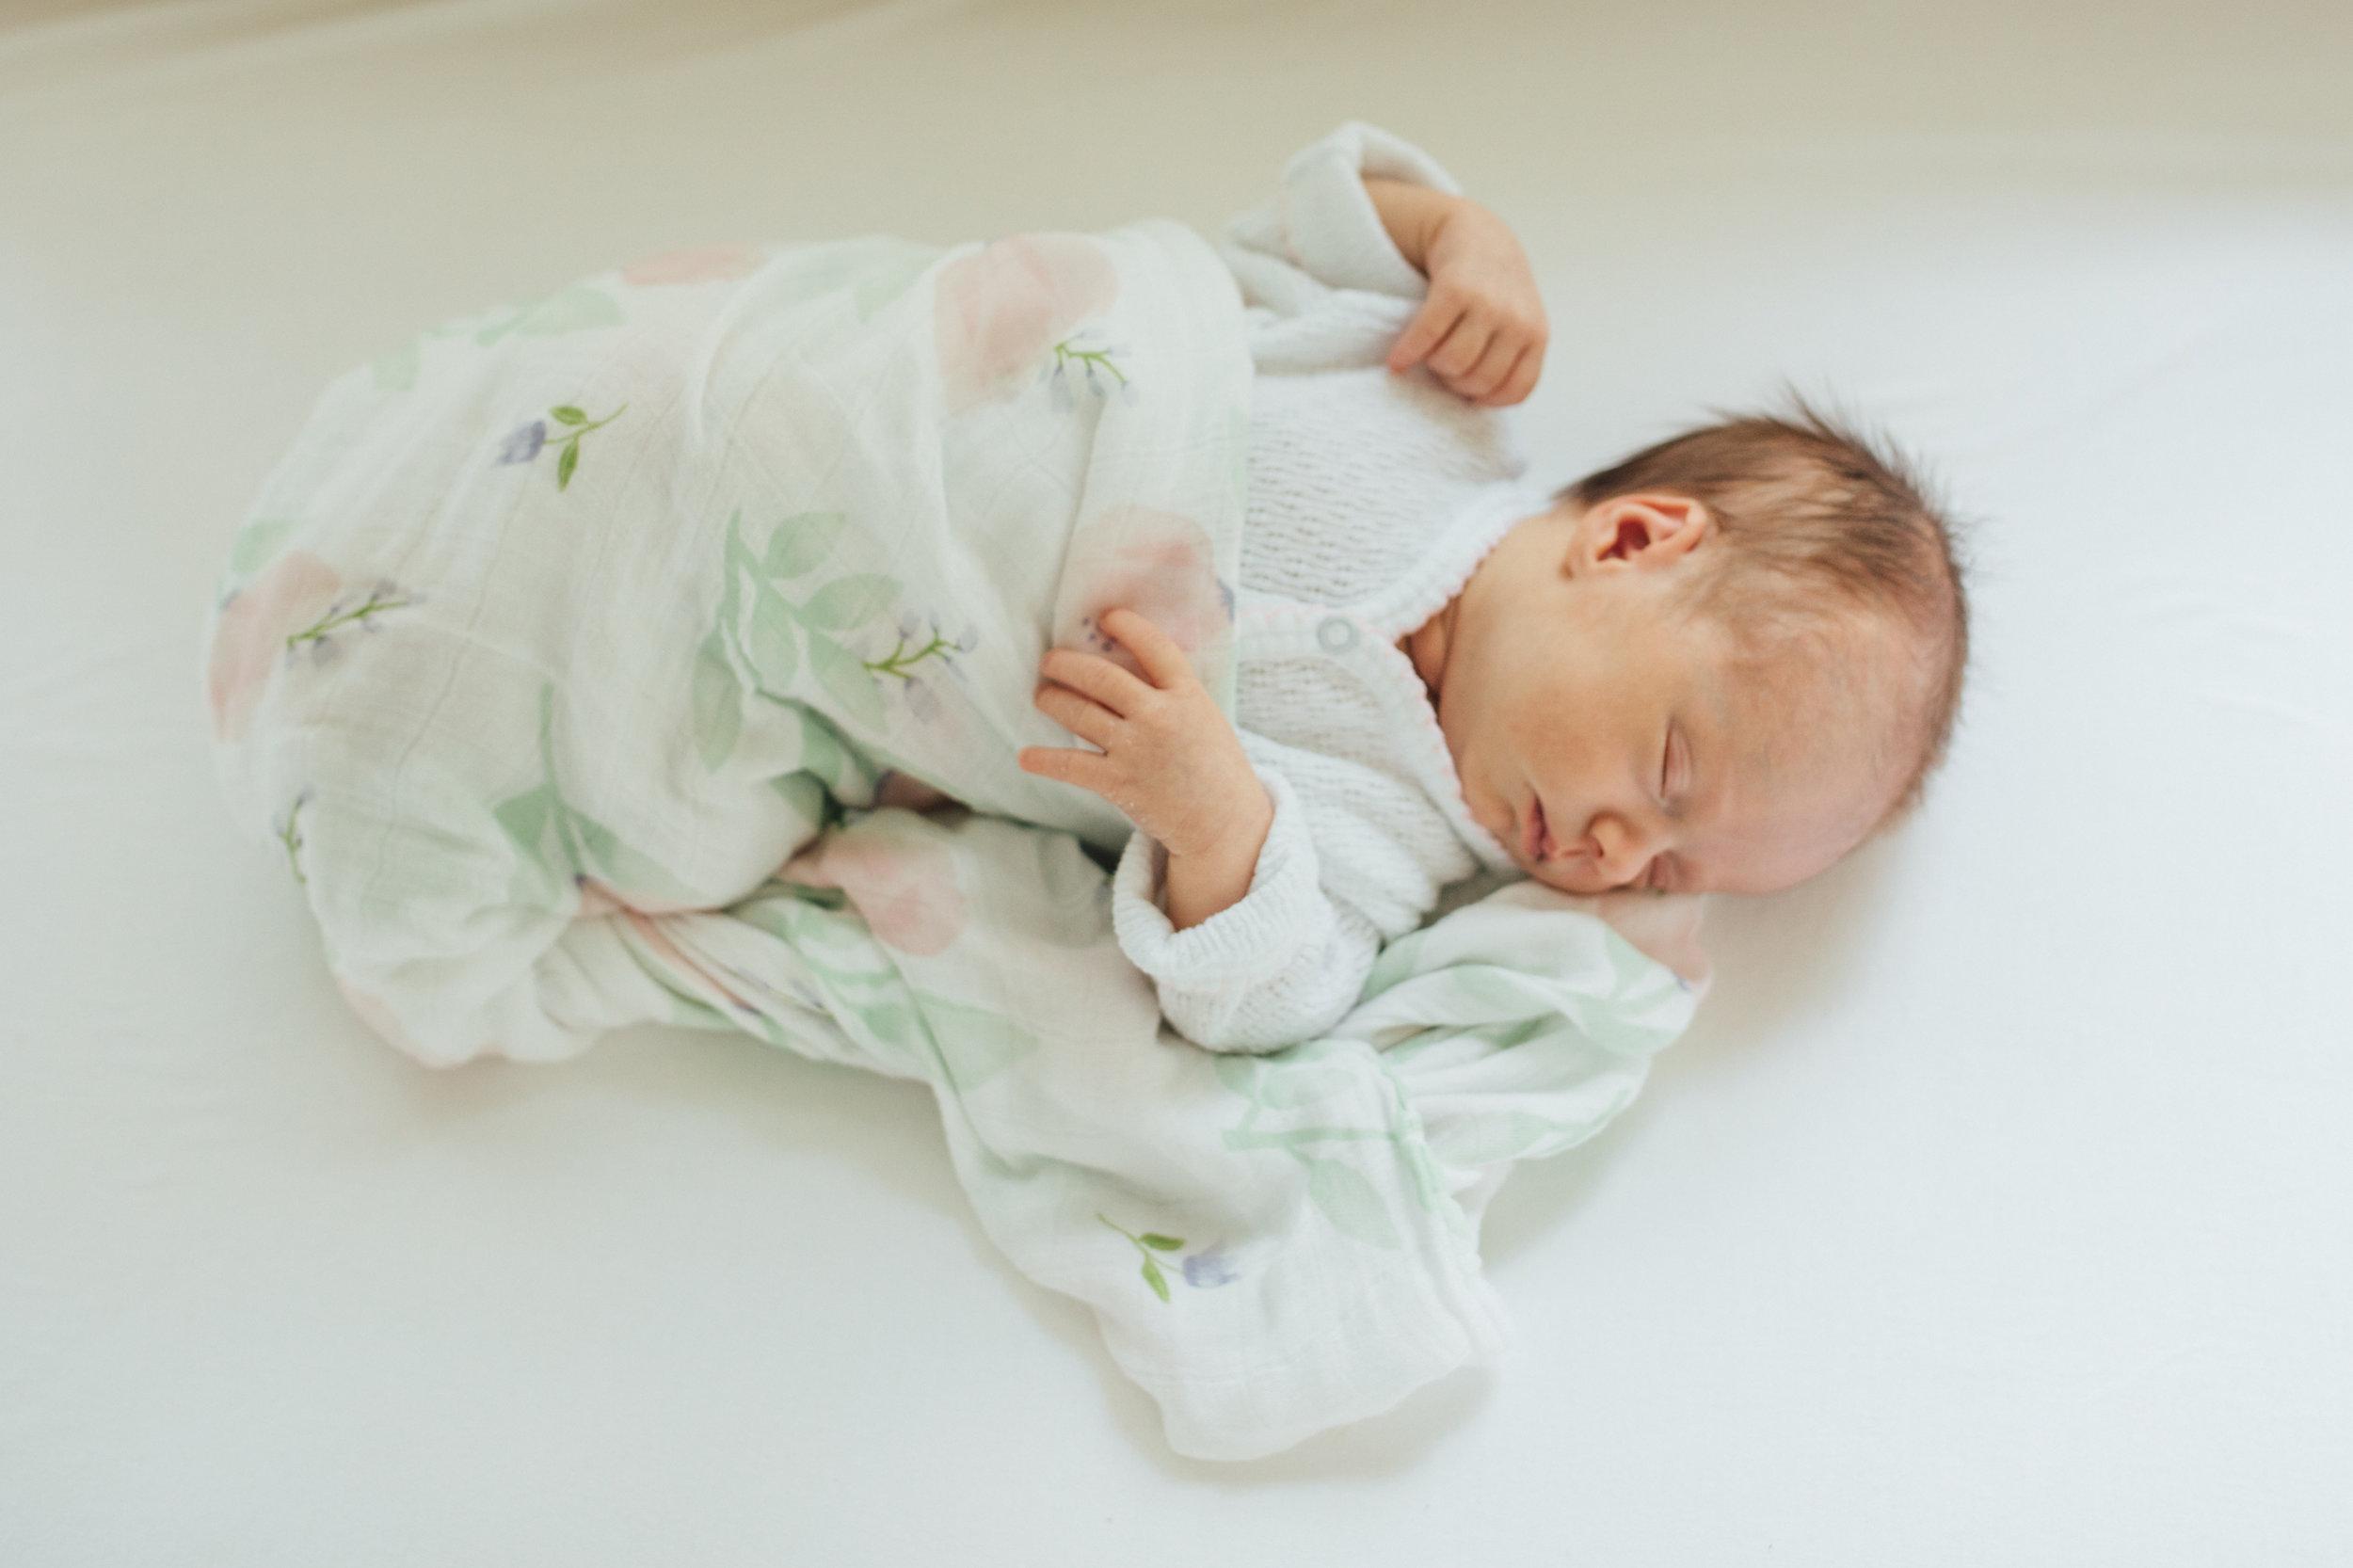 tanner-newborn-18-29.jpg